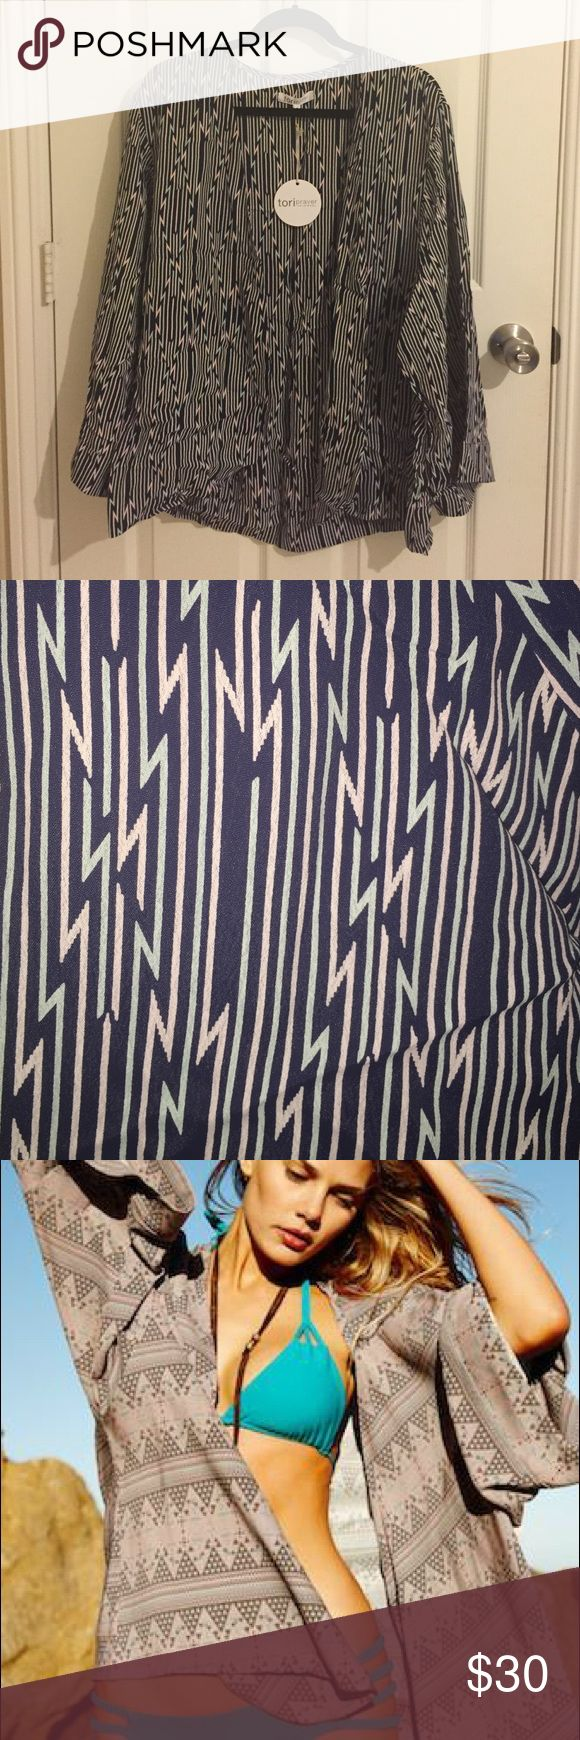 Tori Praver Zanja Kimono - Jaipur Indigo. Size 1 Oversized kimono/cover up.  100% rayon, made in USA, BNWT.  Resort 2015 collection. Tori Praver Swimwear Swim Coverups